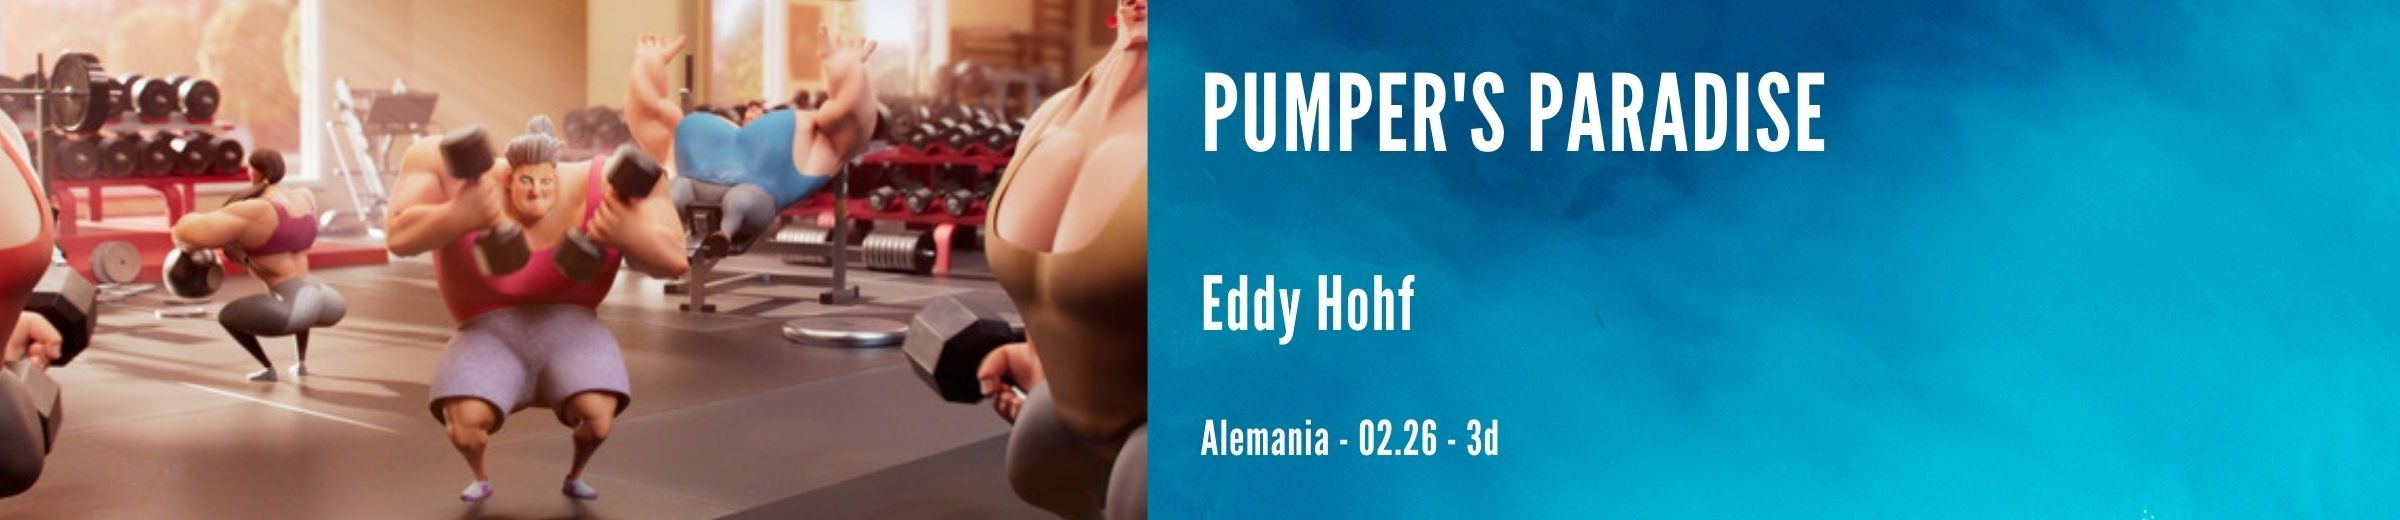 pumpers